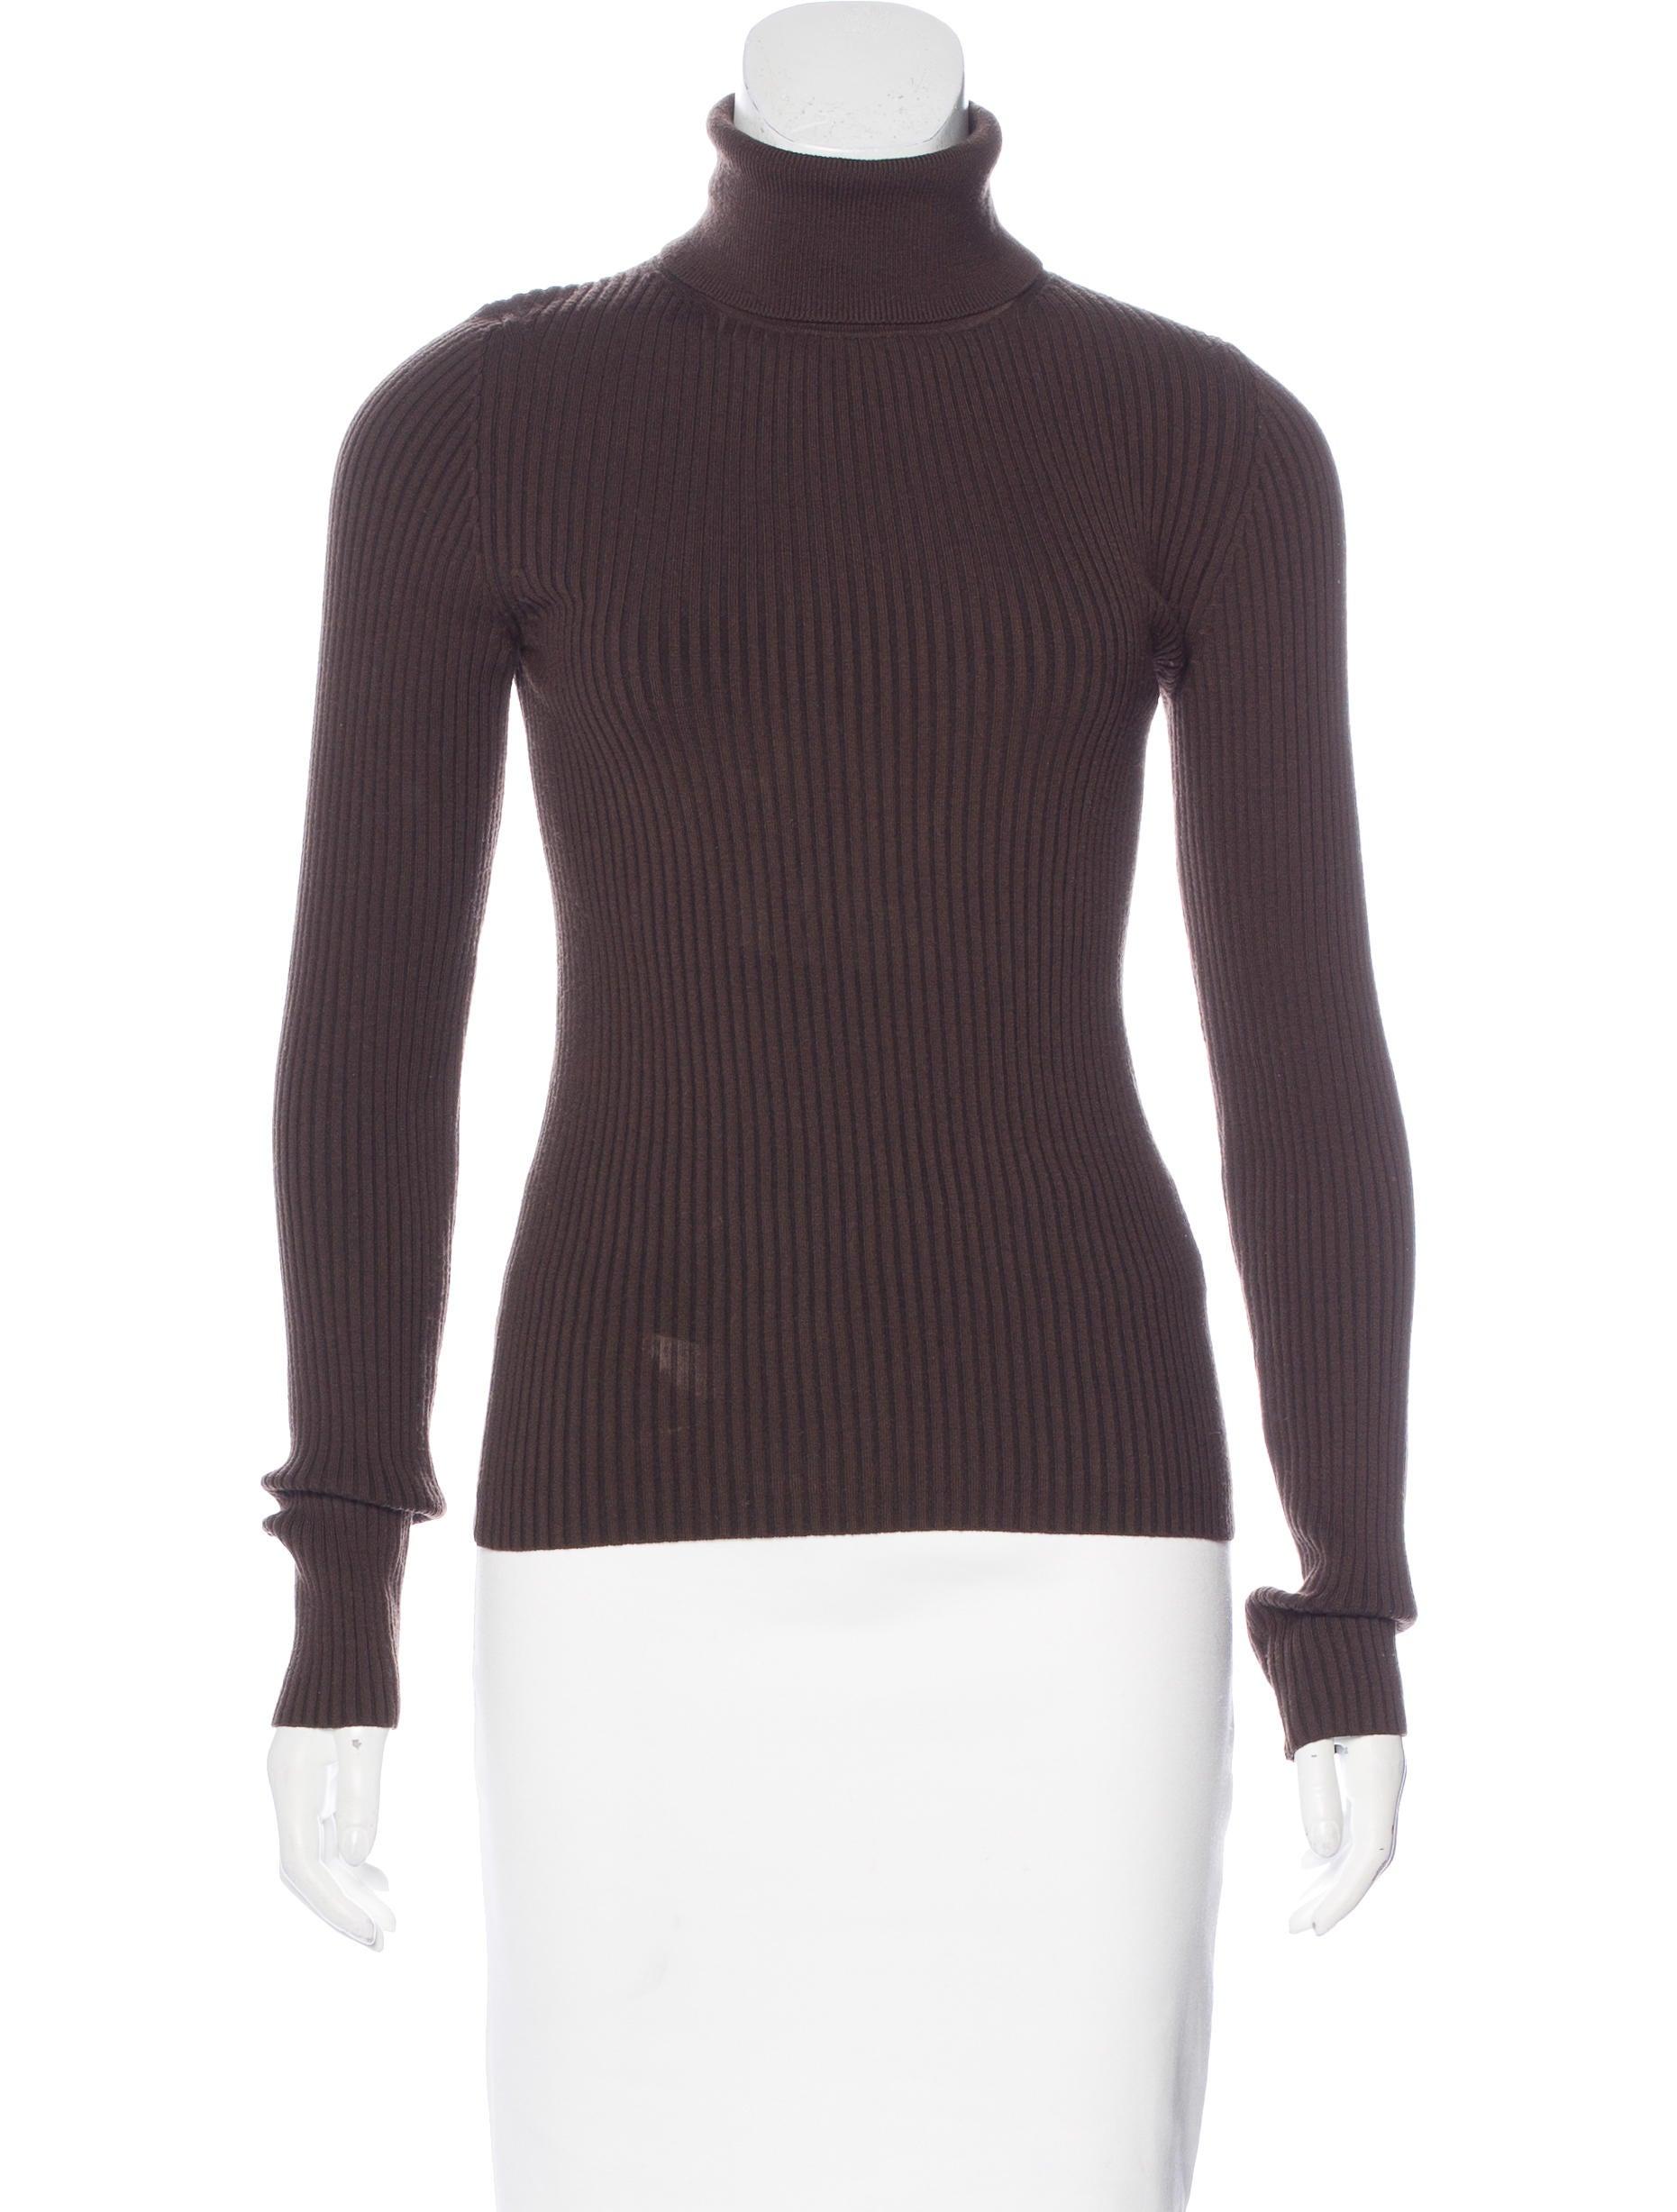 Michael kors wool rib knit top clothing mic50900 the for Best wool shirt jackets